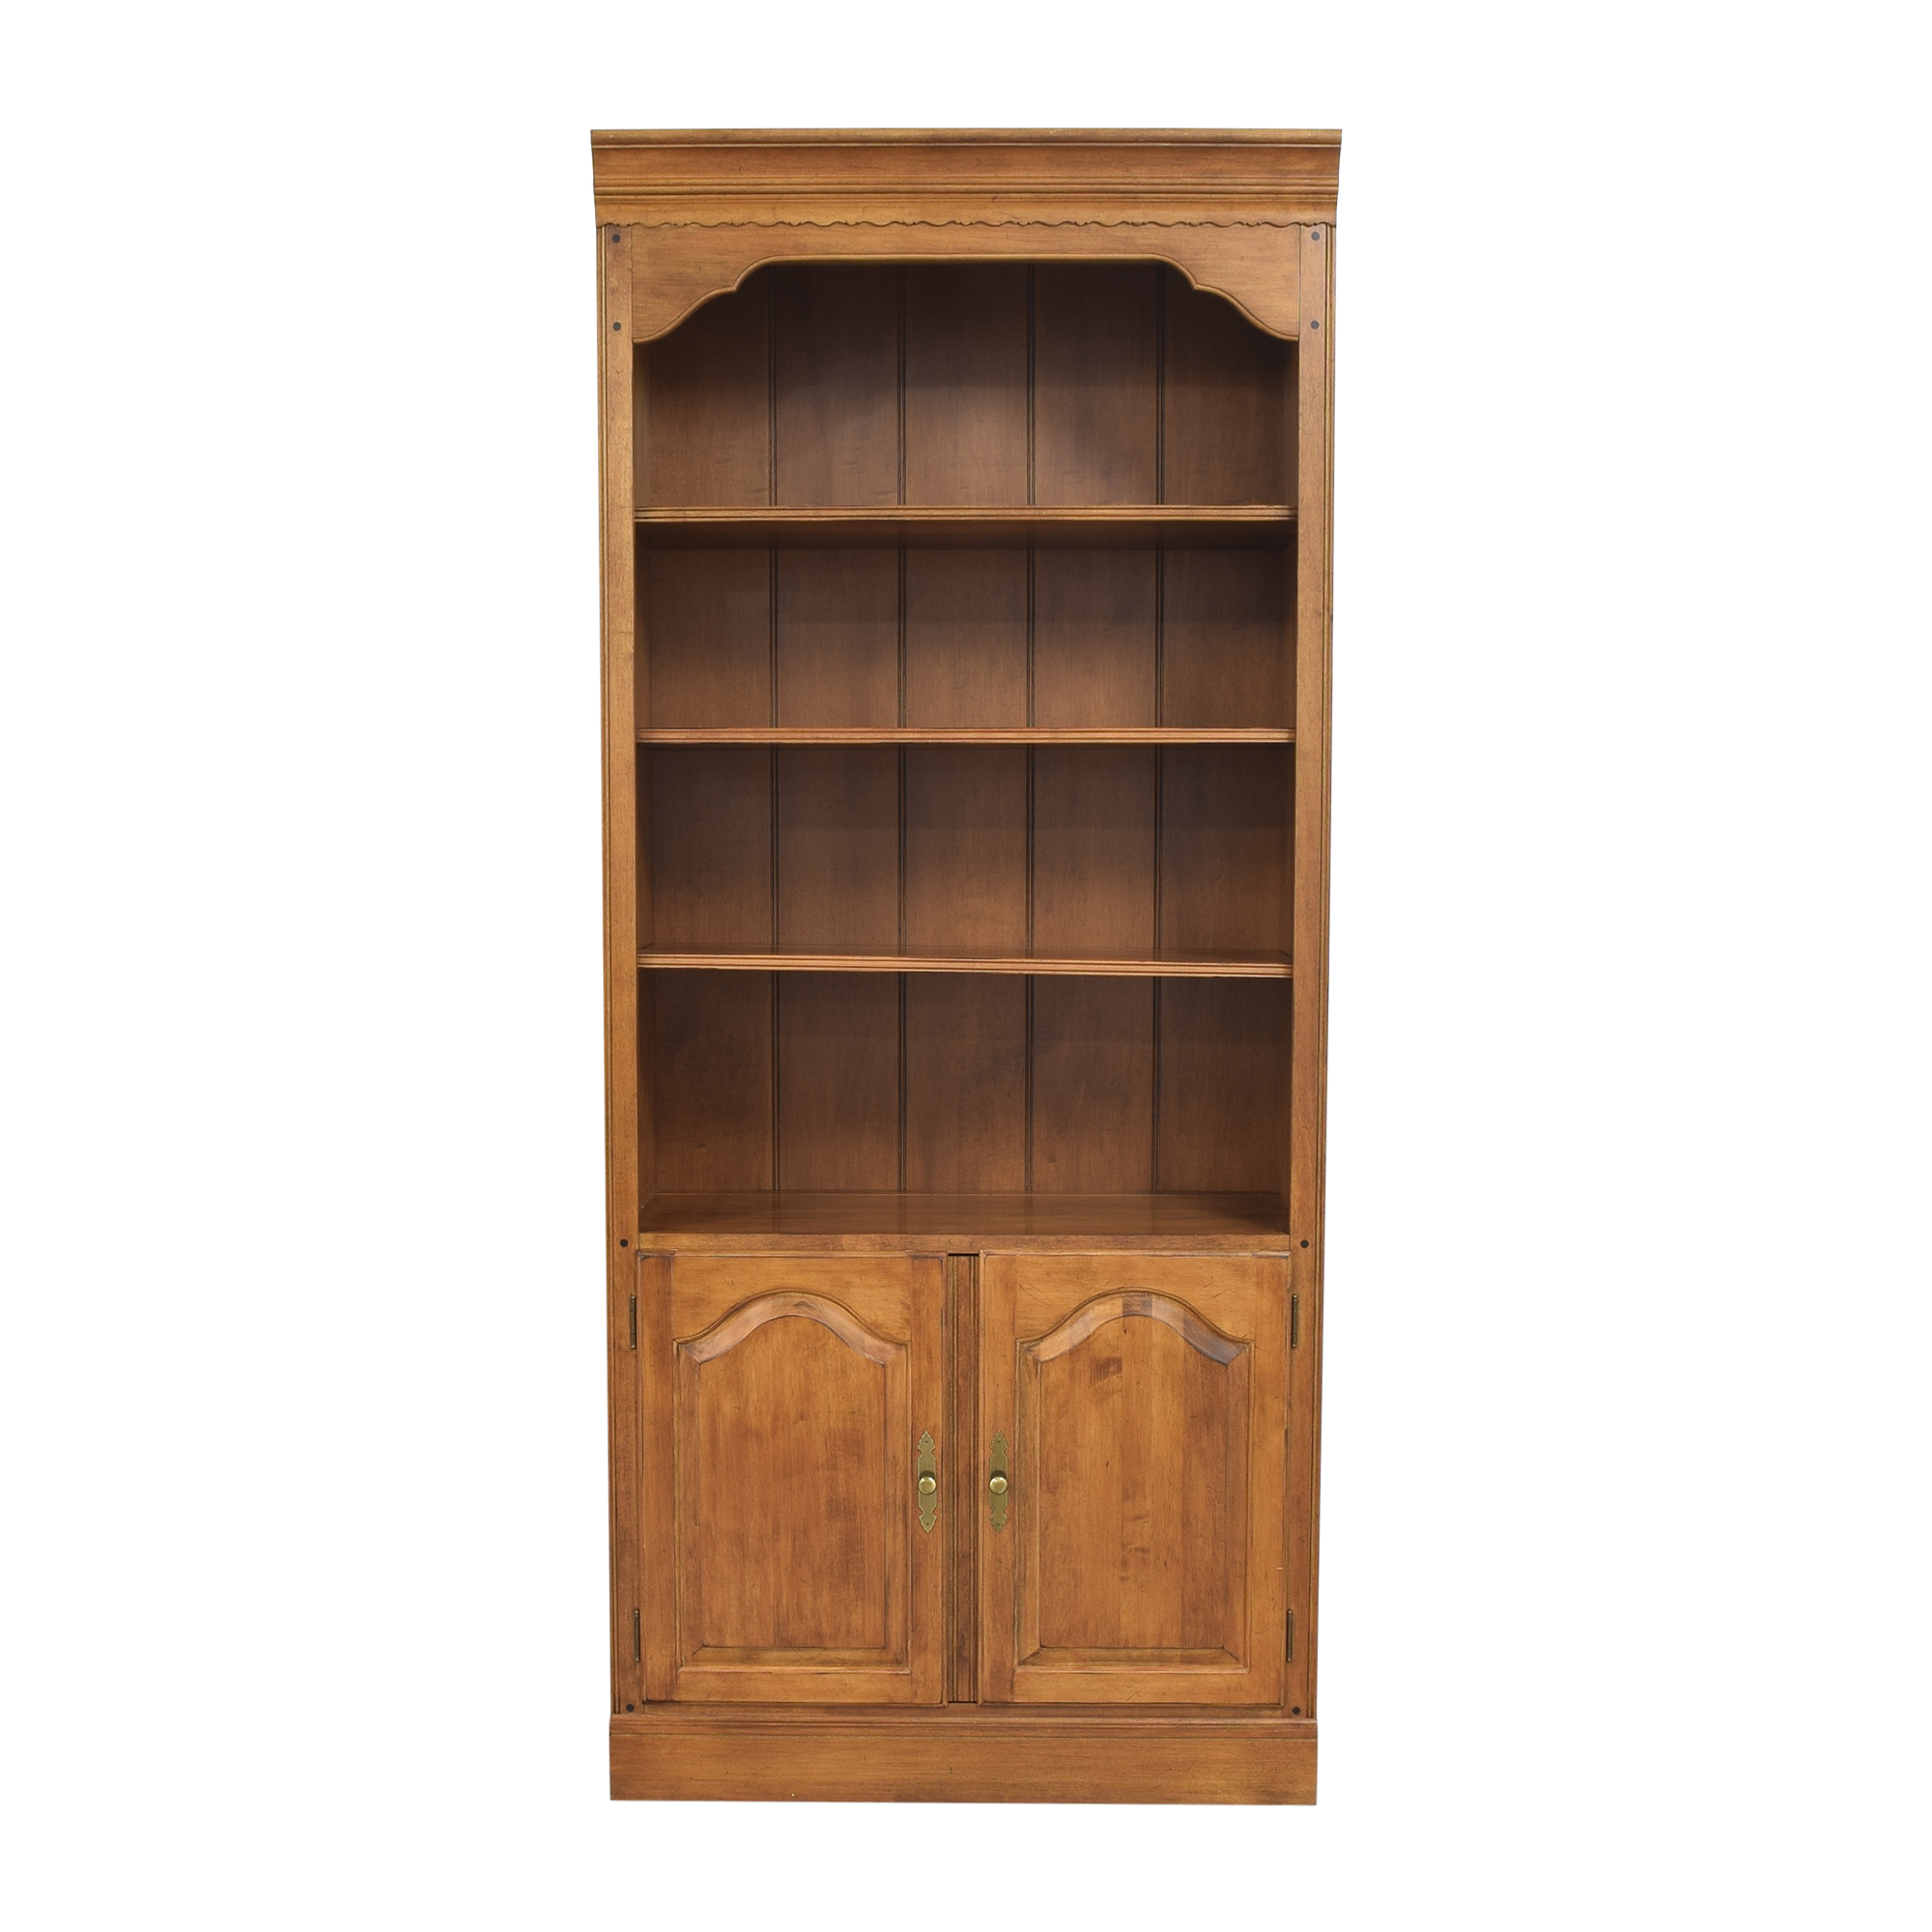 Ethan Allen Circa 1776 Collection Bookcase with Cabinet Ethan Allen